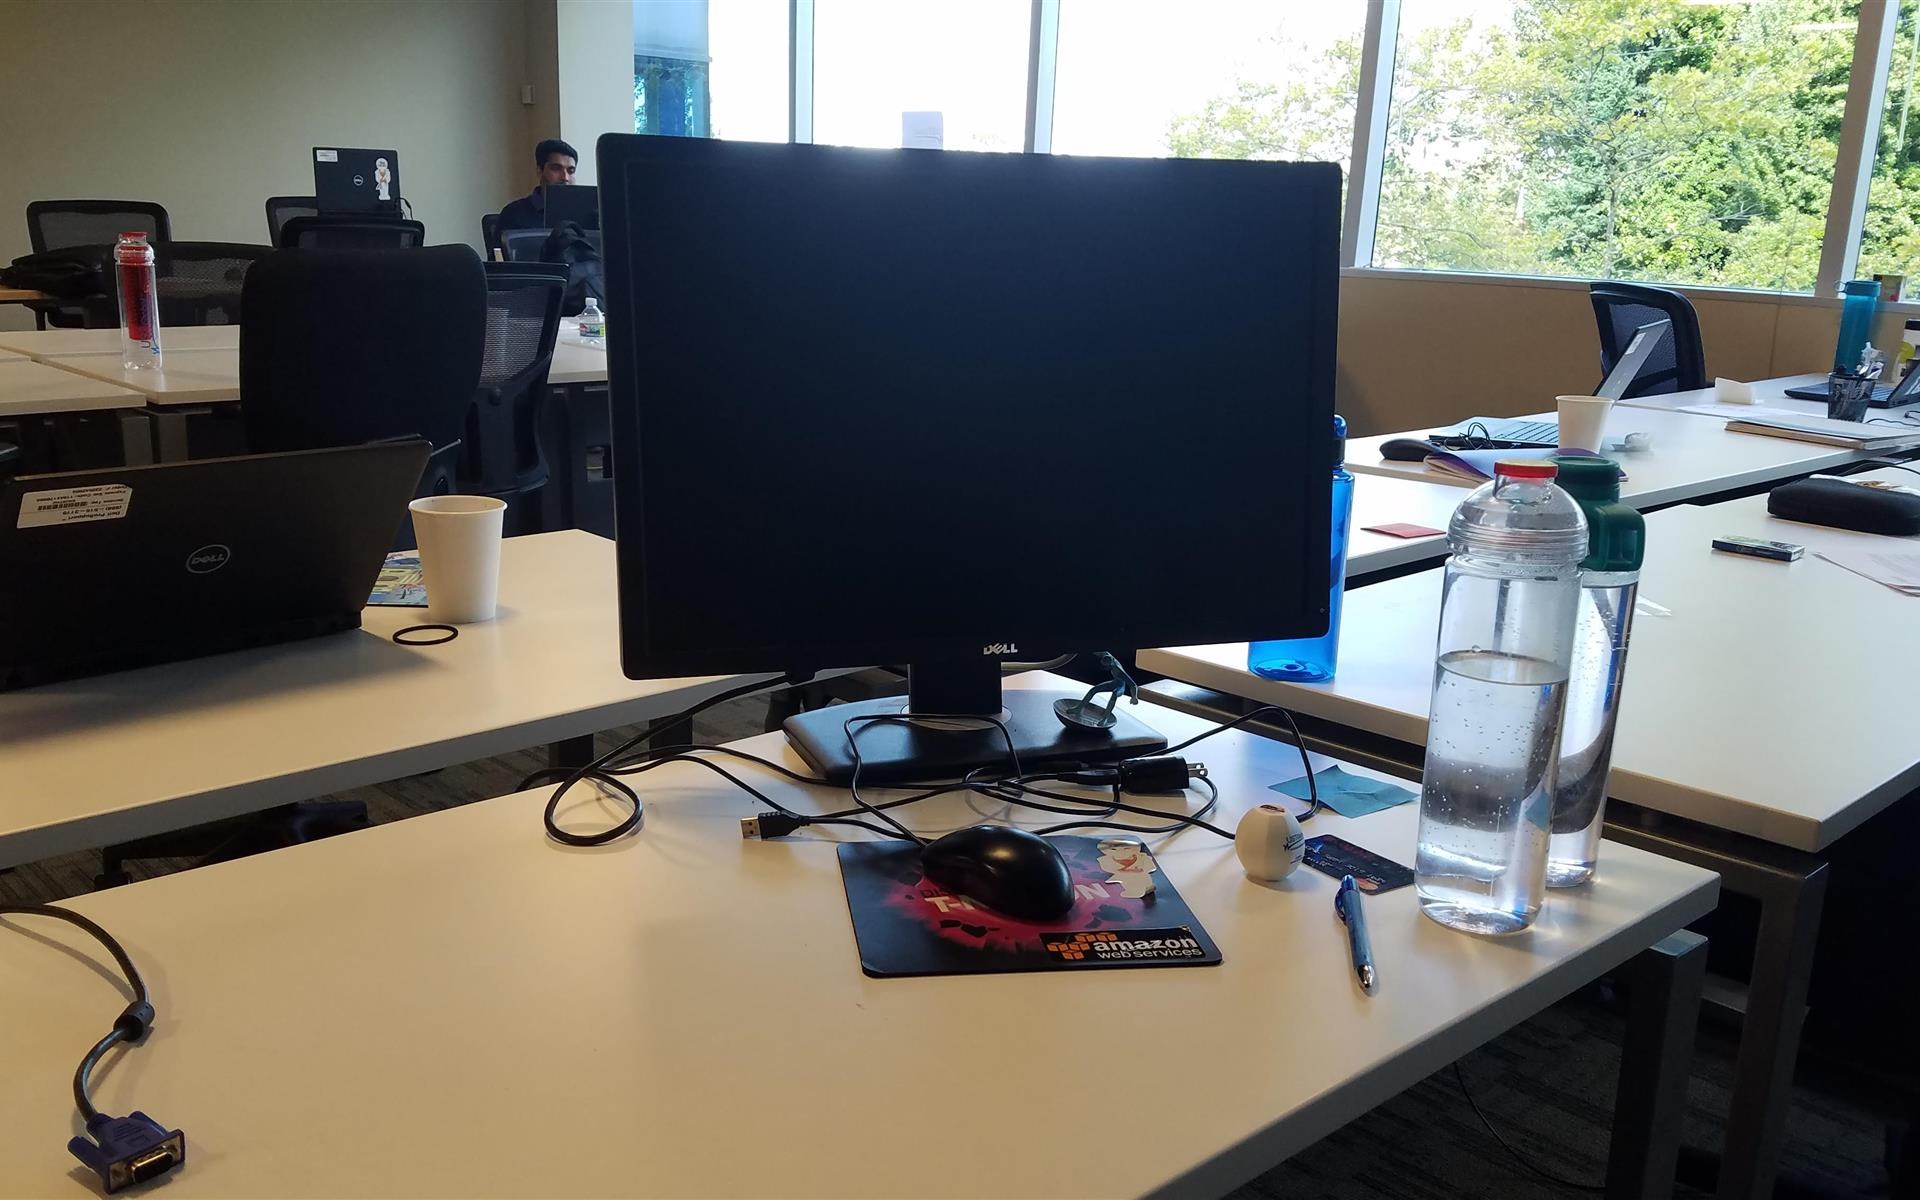 extraSlice - Fixed Desk